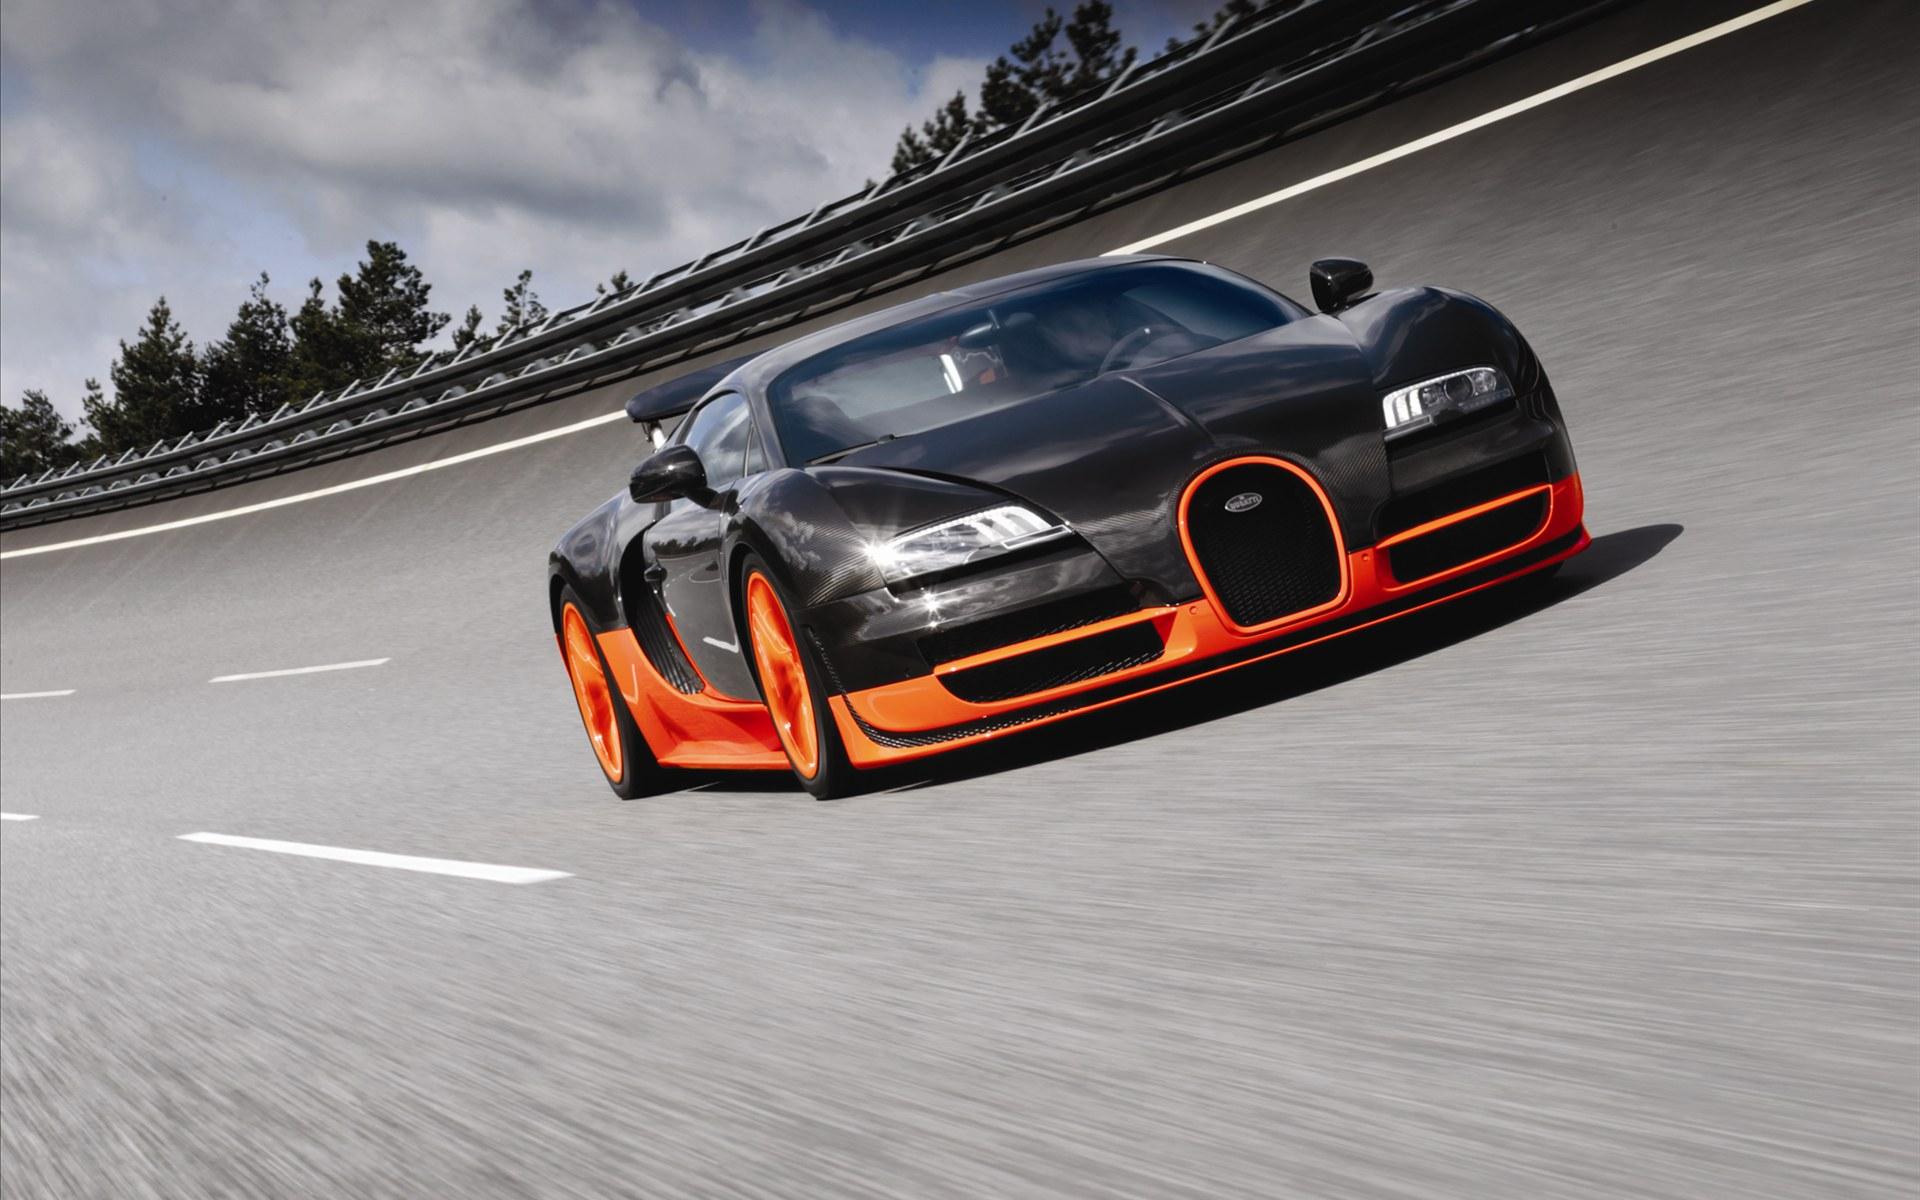 Bugatti Veyron Wallpaper Computer HD